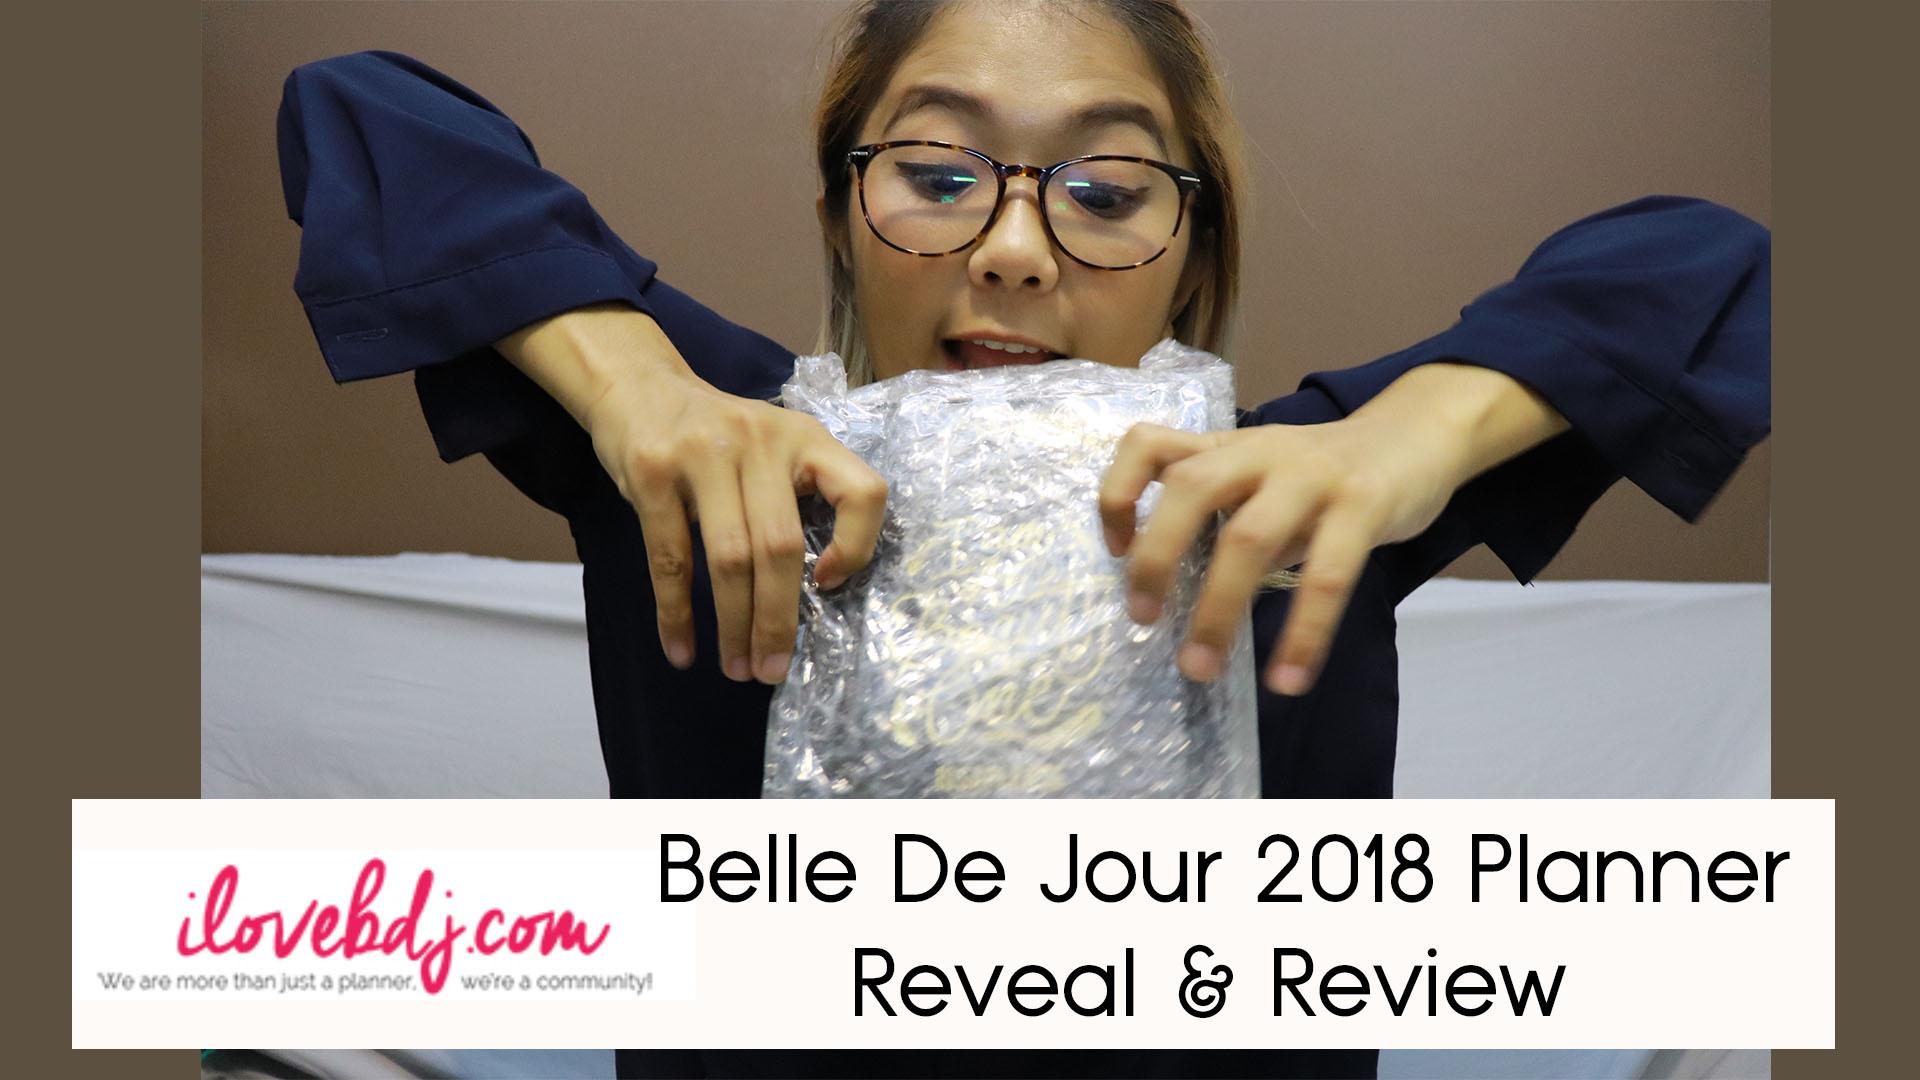 Belle De Jour 2018 Planner Review & Reveal + Lots of Brain Farts